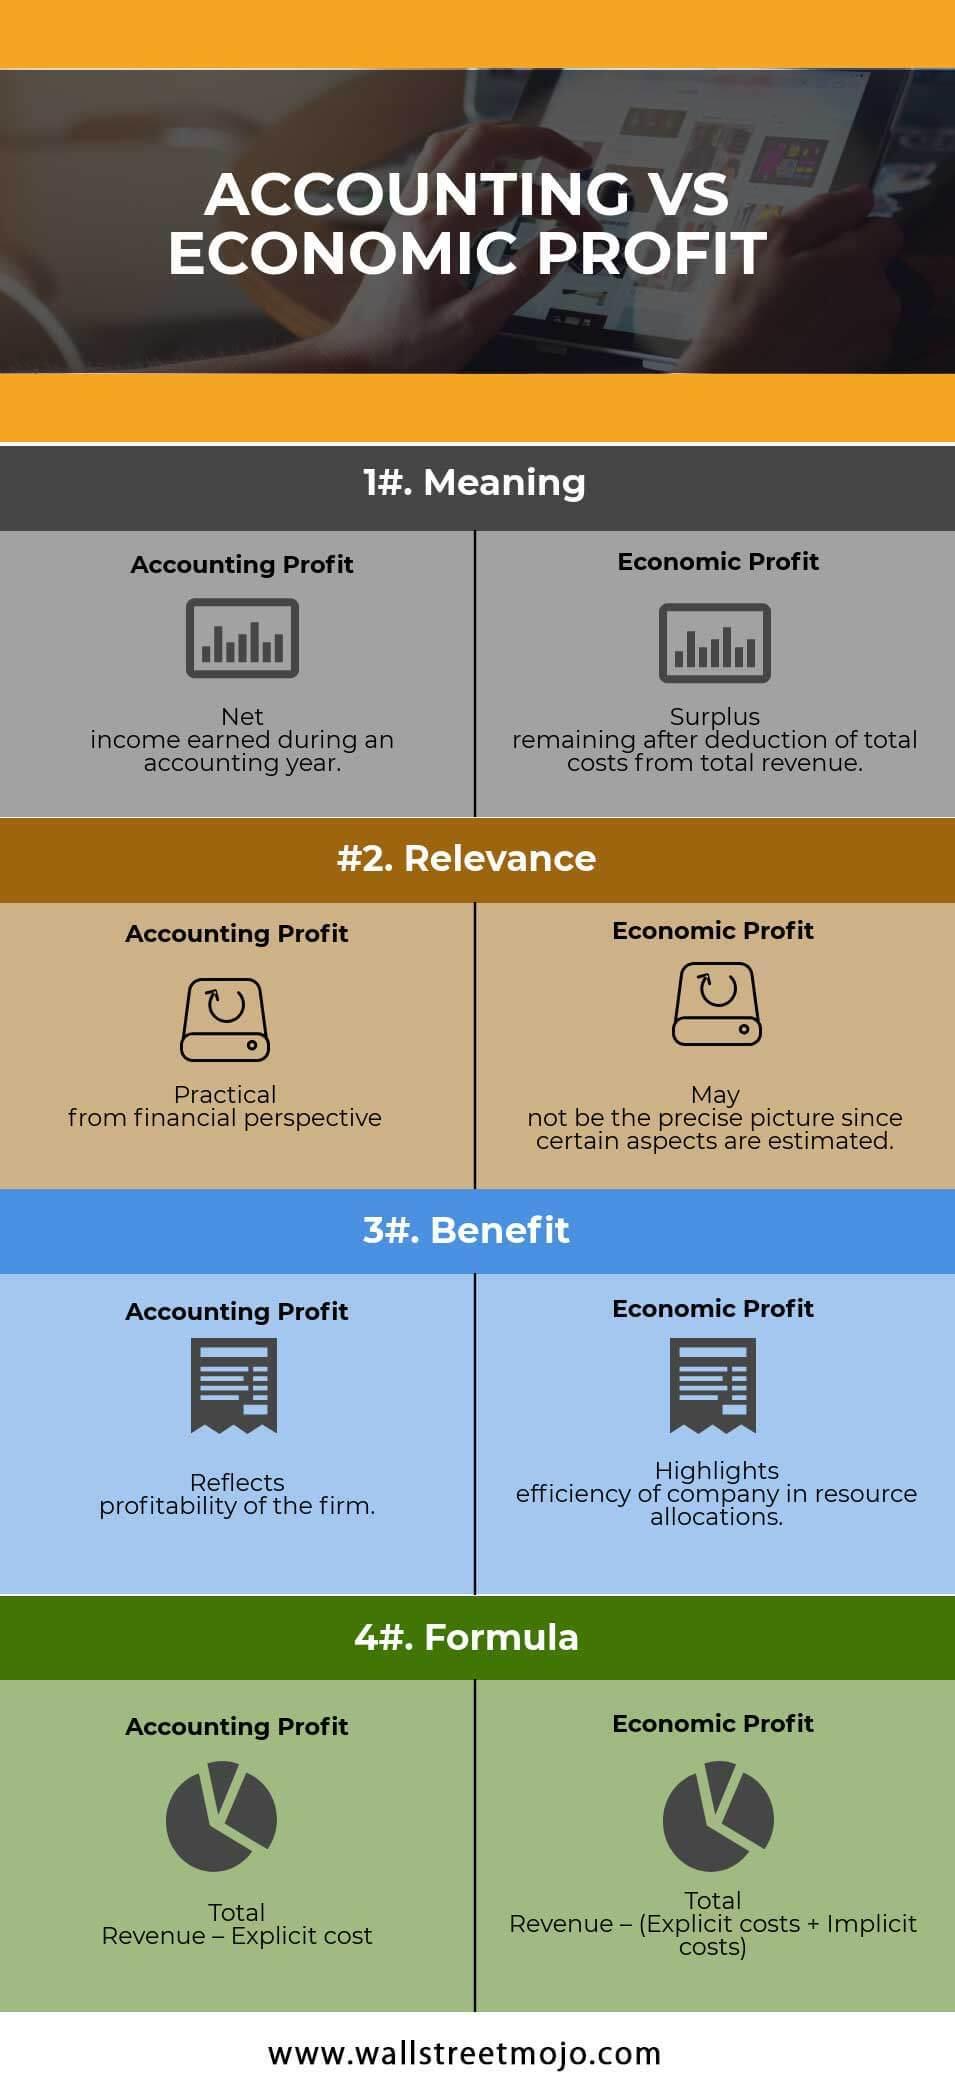 ACCOUNTING VS ECONOMIC PROFIT